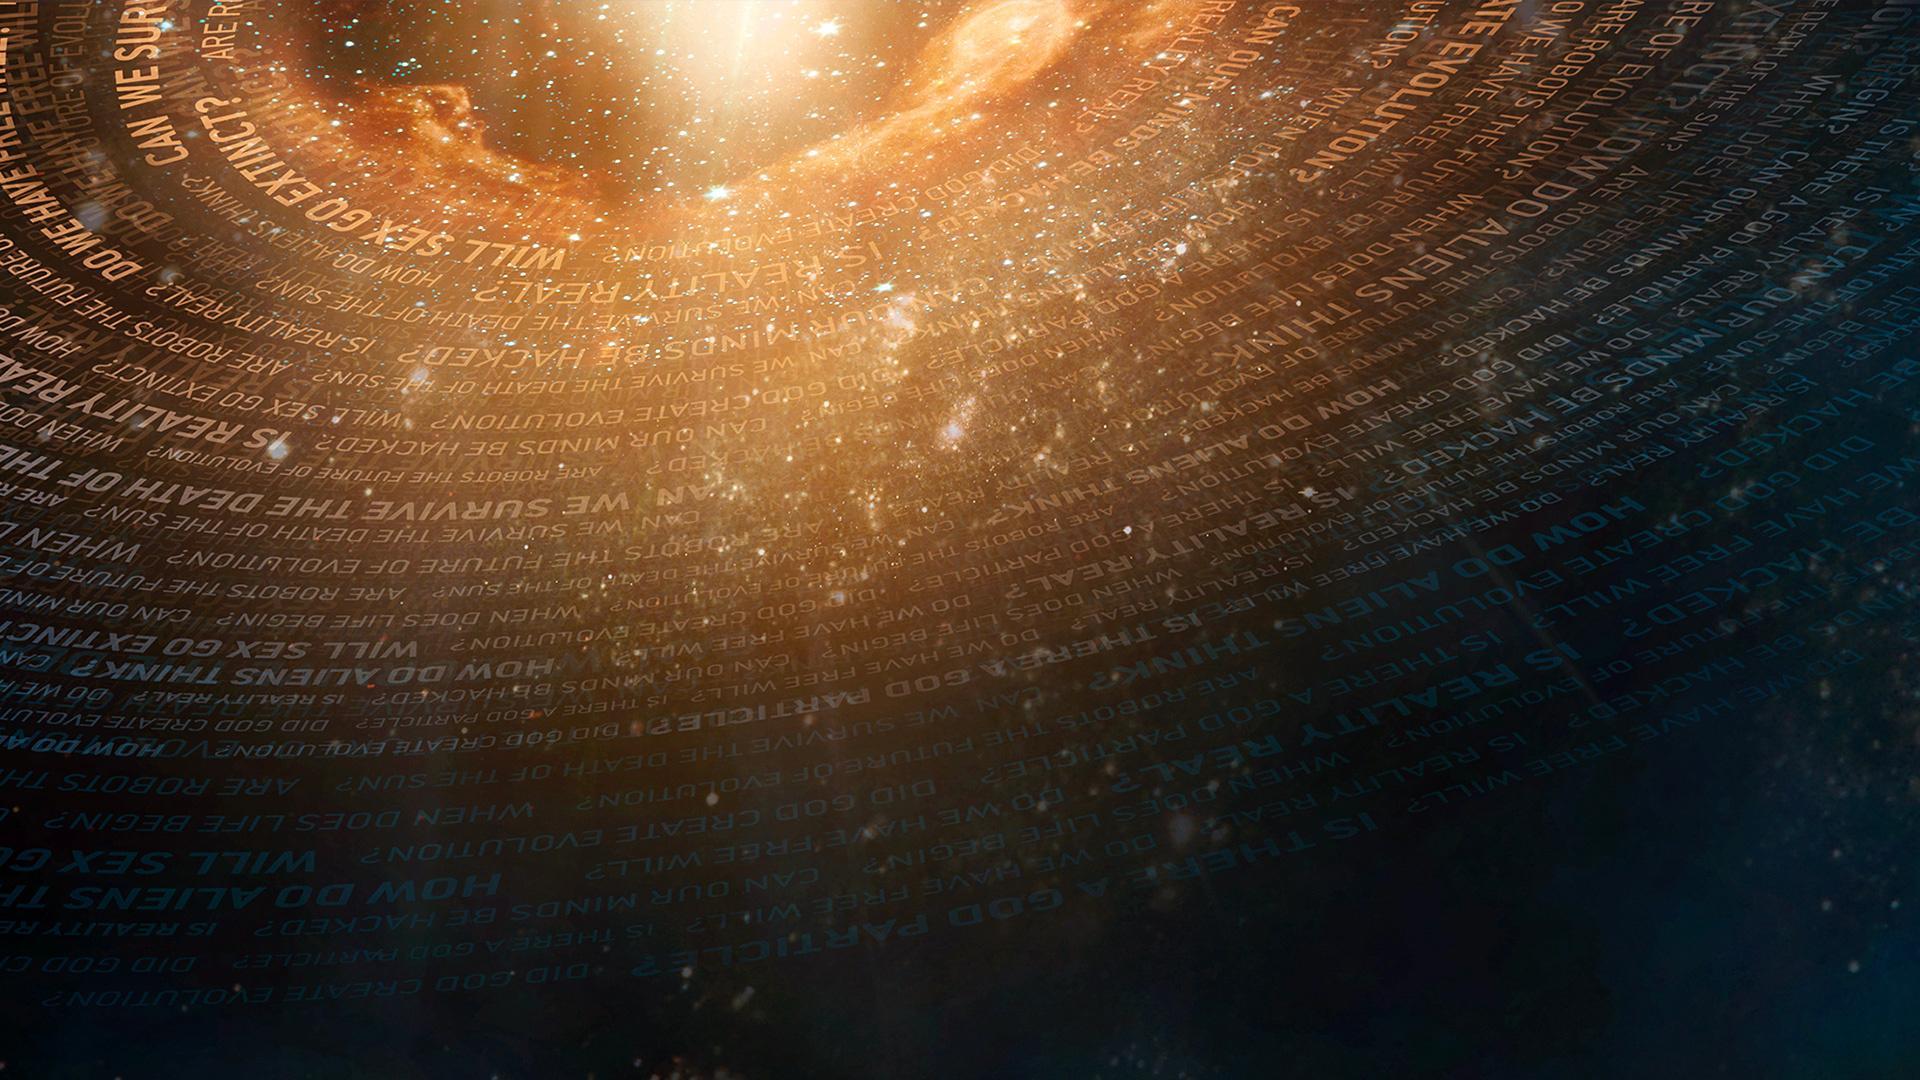 Discovery Sci HD Morgan Freeman Science Show